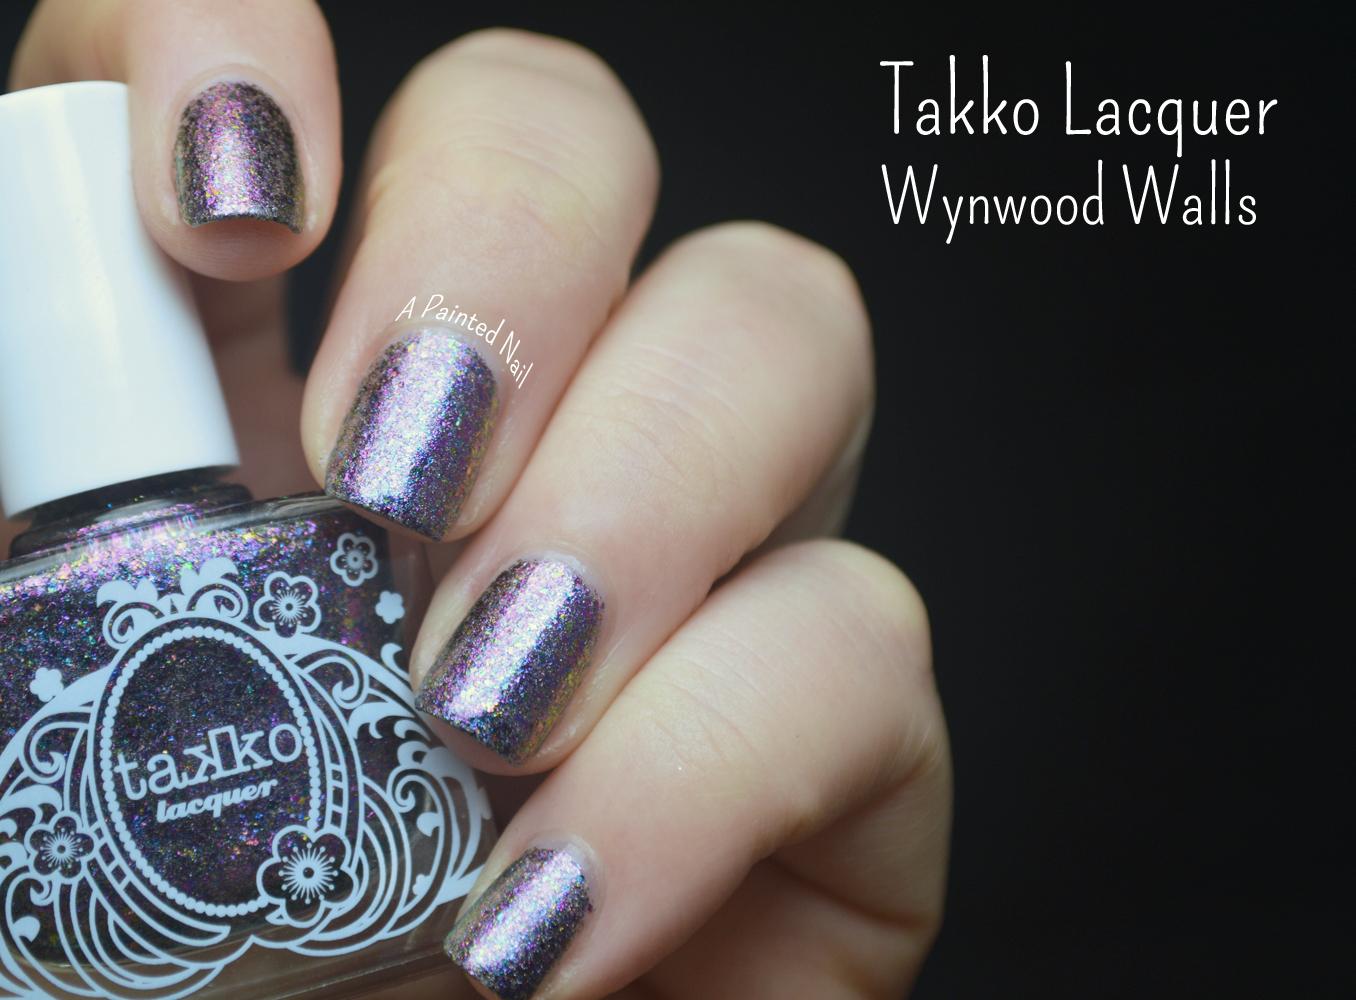 Takko Lacquer Wynwood Walls